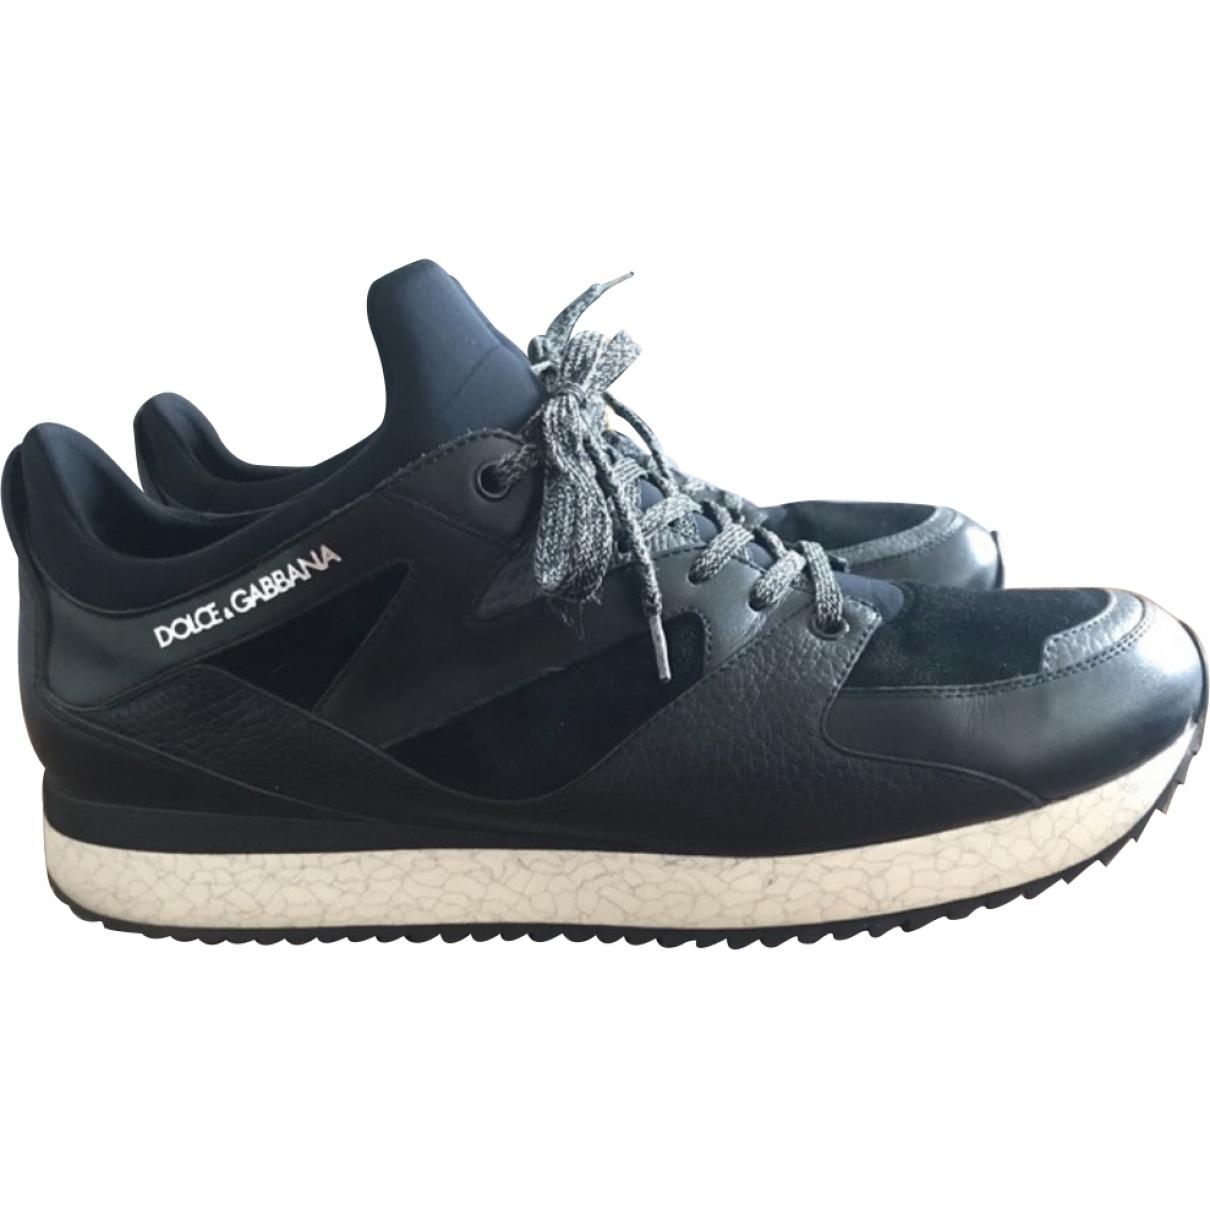 Dolce & Gabbana \N Black Leather Trainers for Men 45 EU